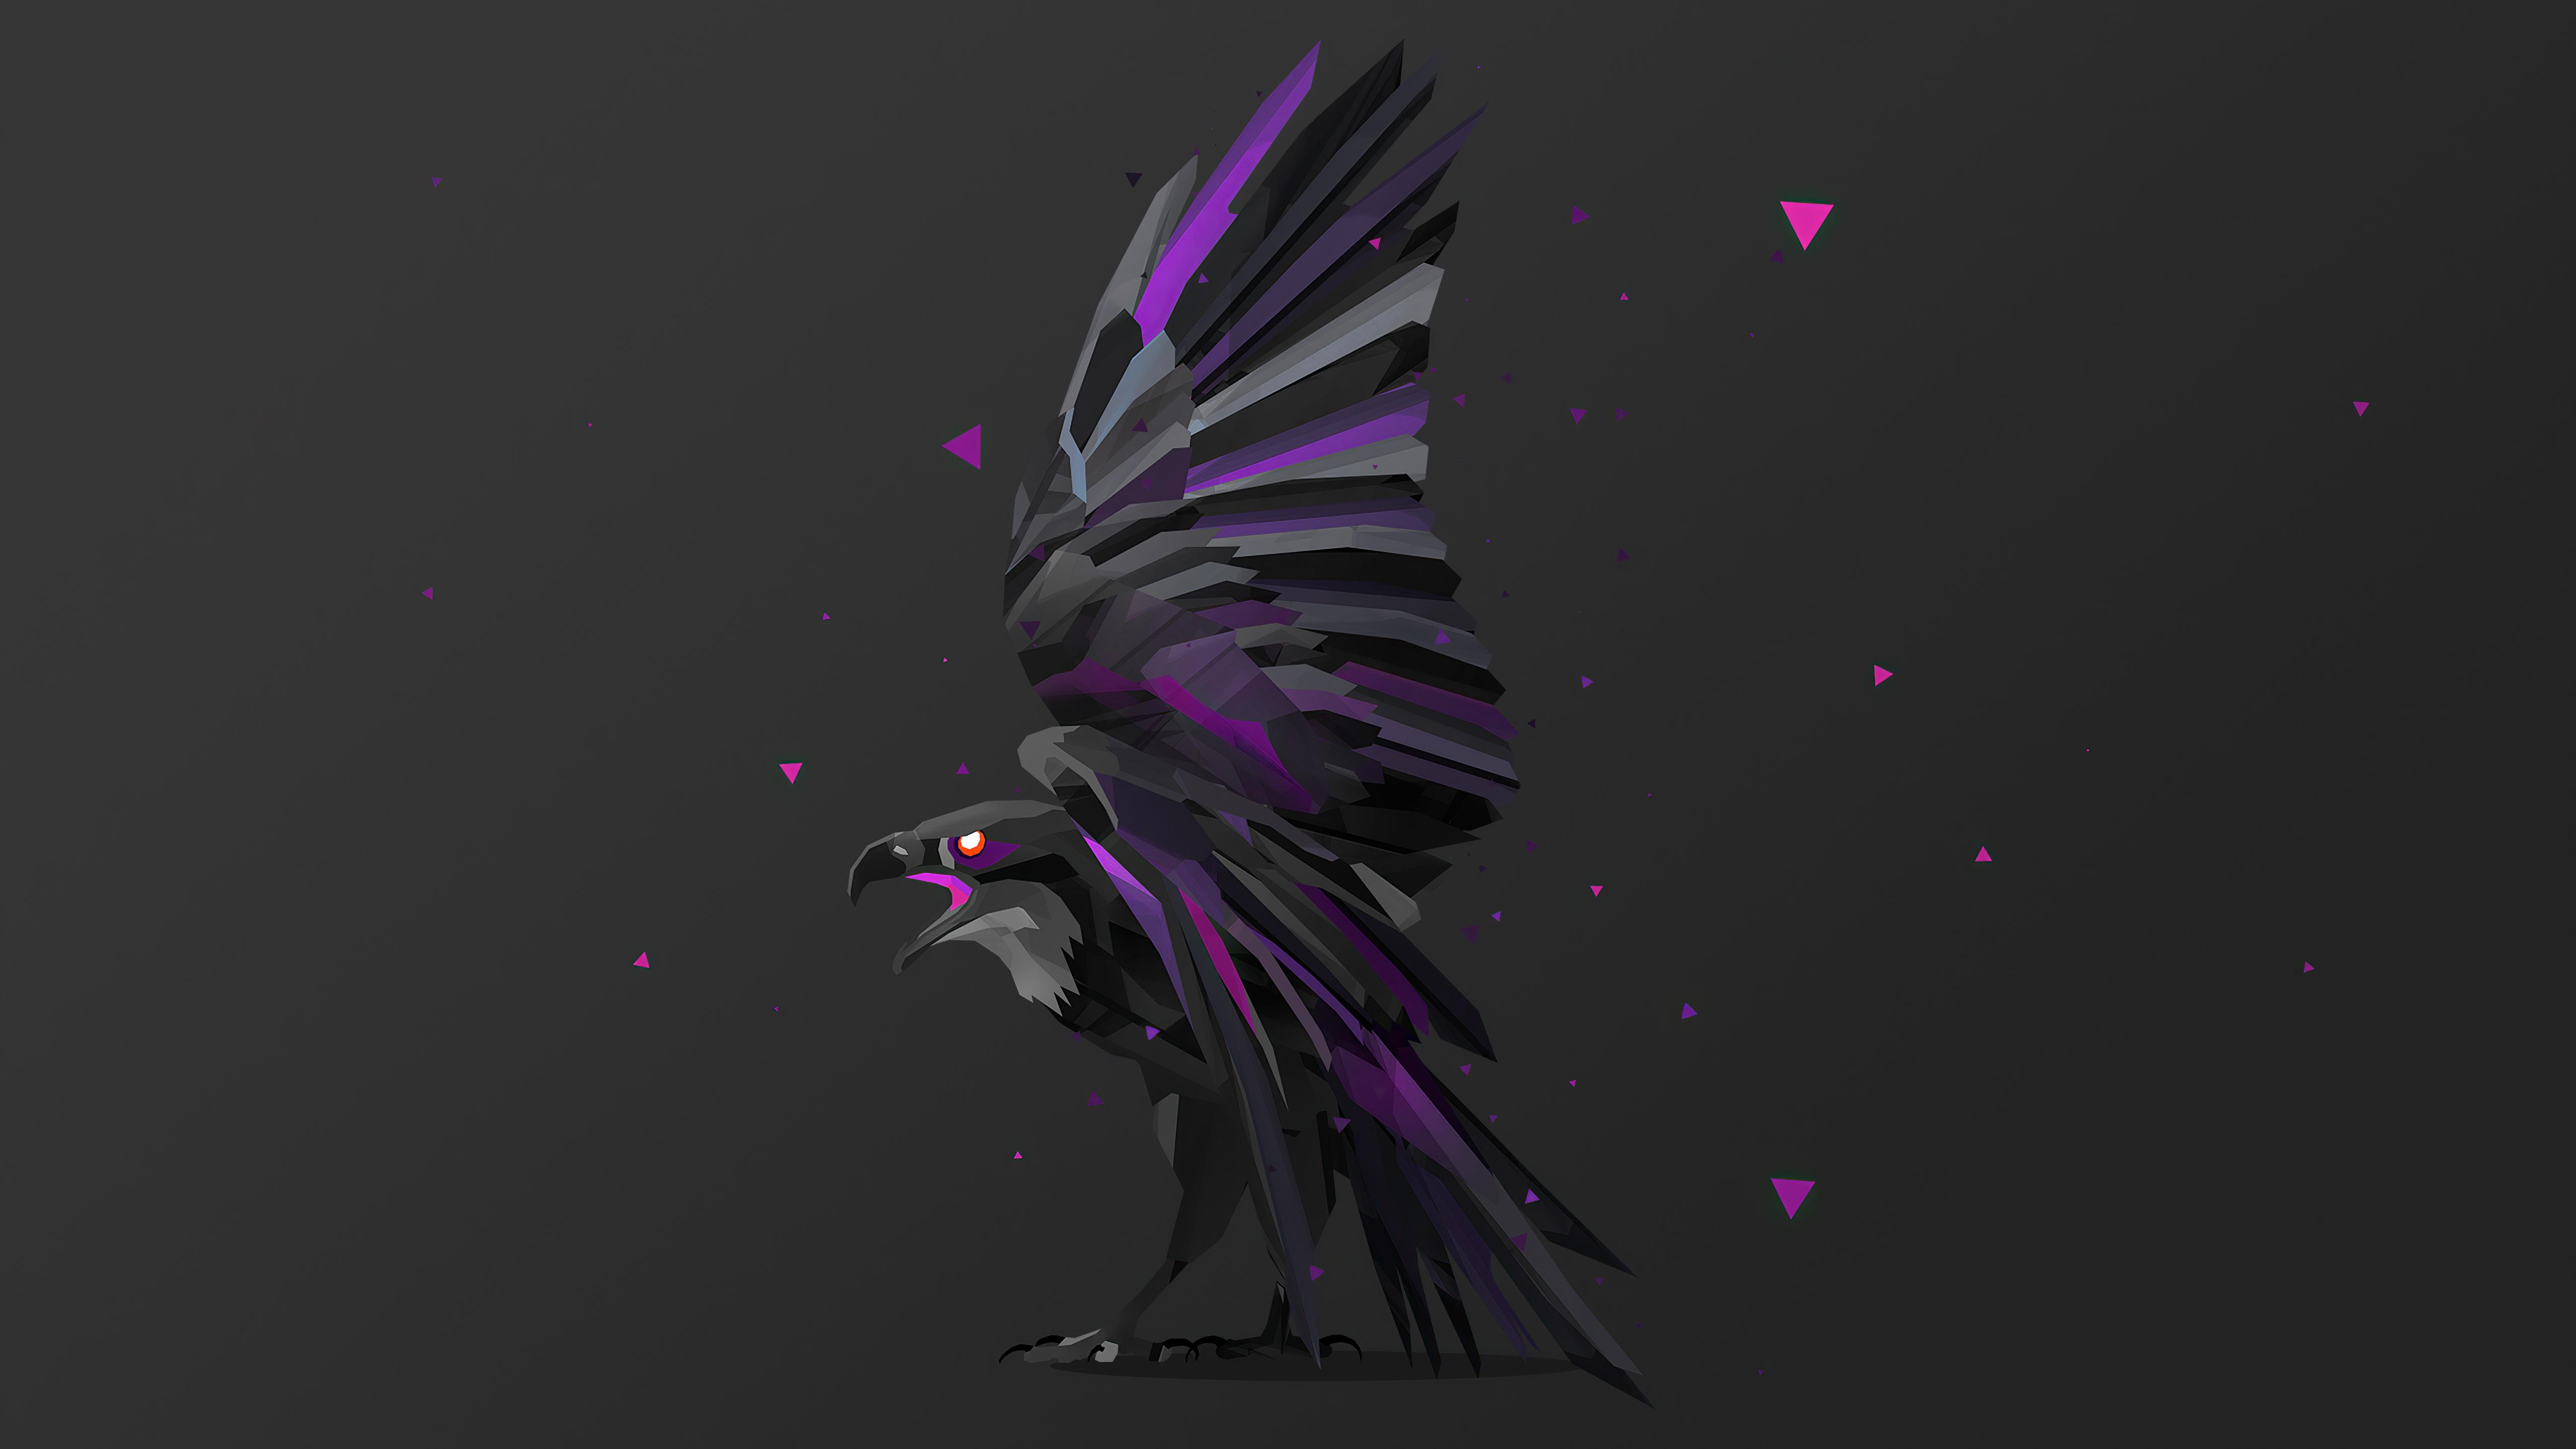 bird-fractal-art-5k-xm.jpg